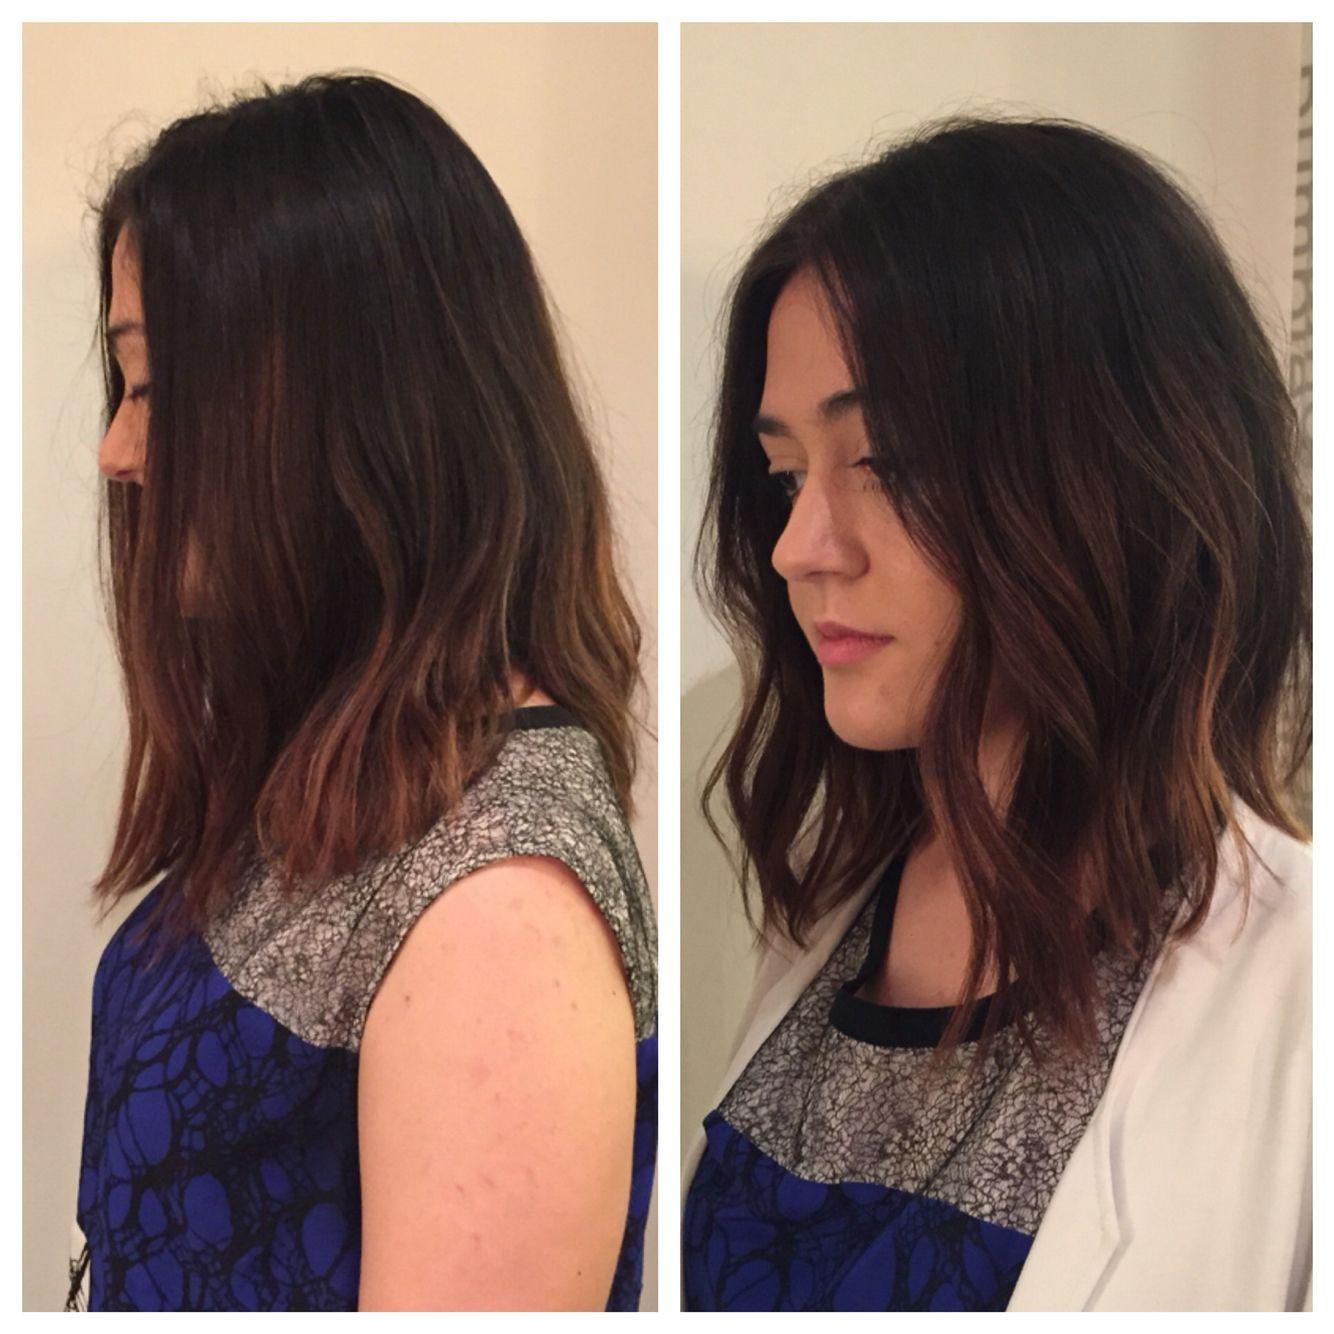 Before And After Razor Bob Lob Long Bob Haircut Texture - Razor haircut